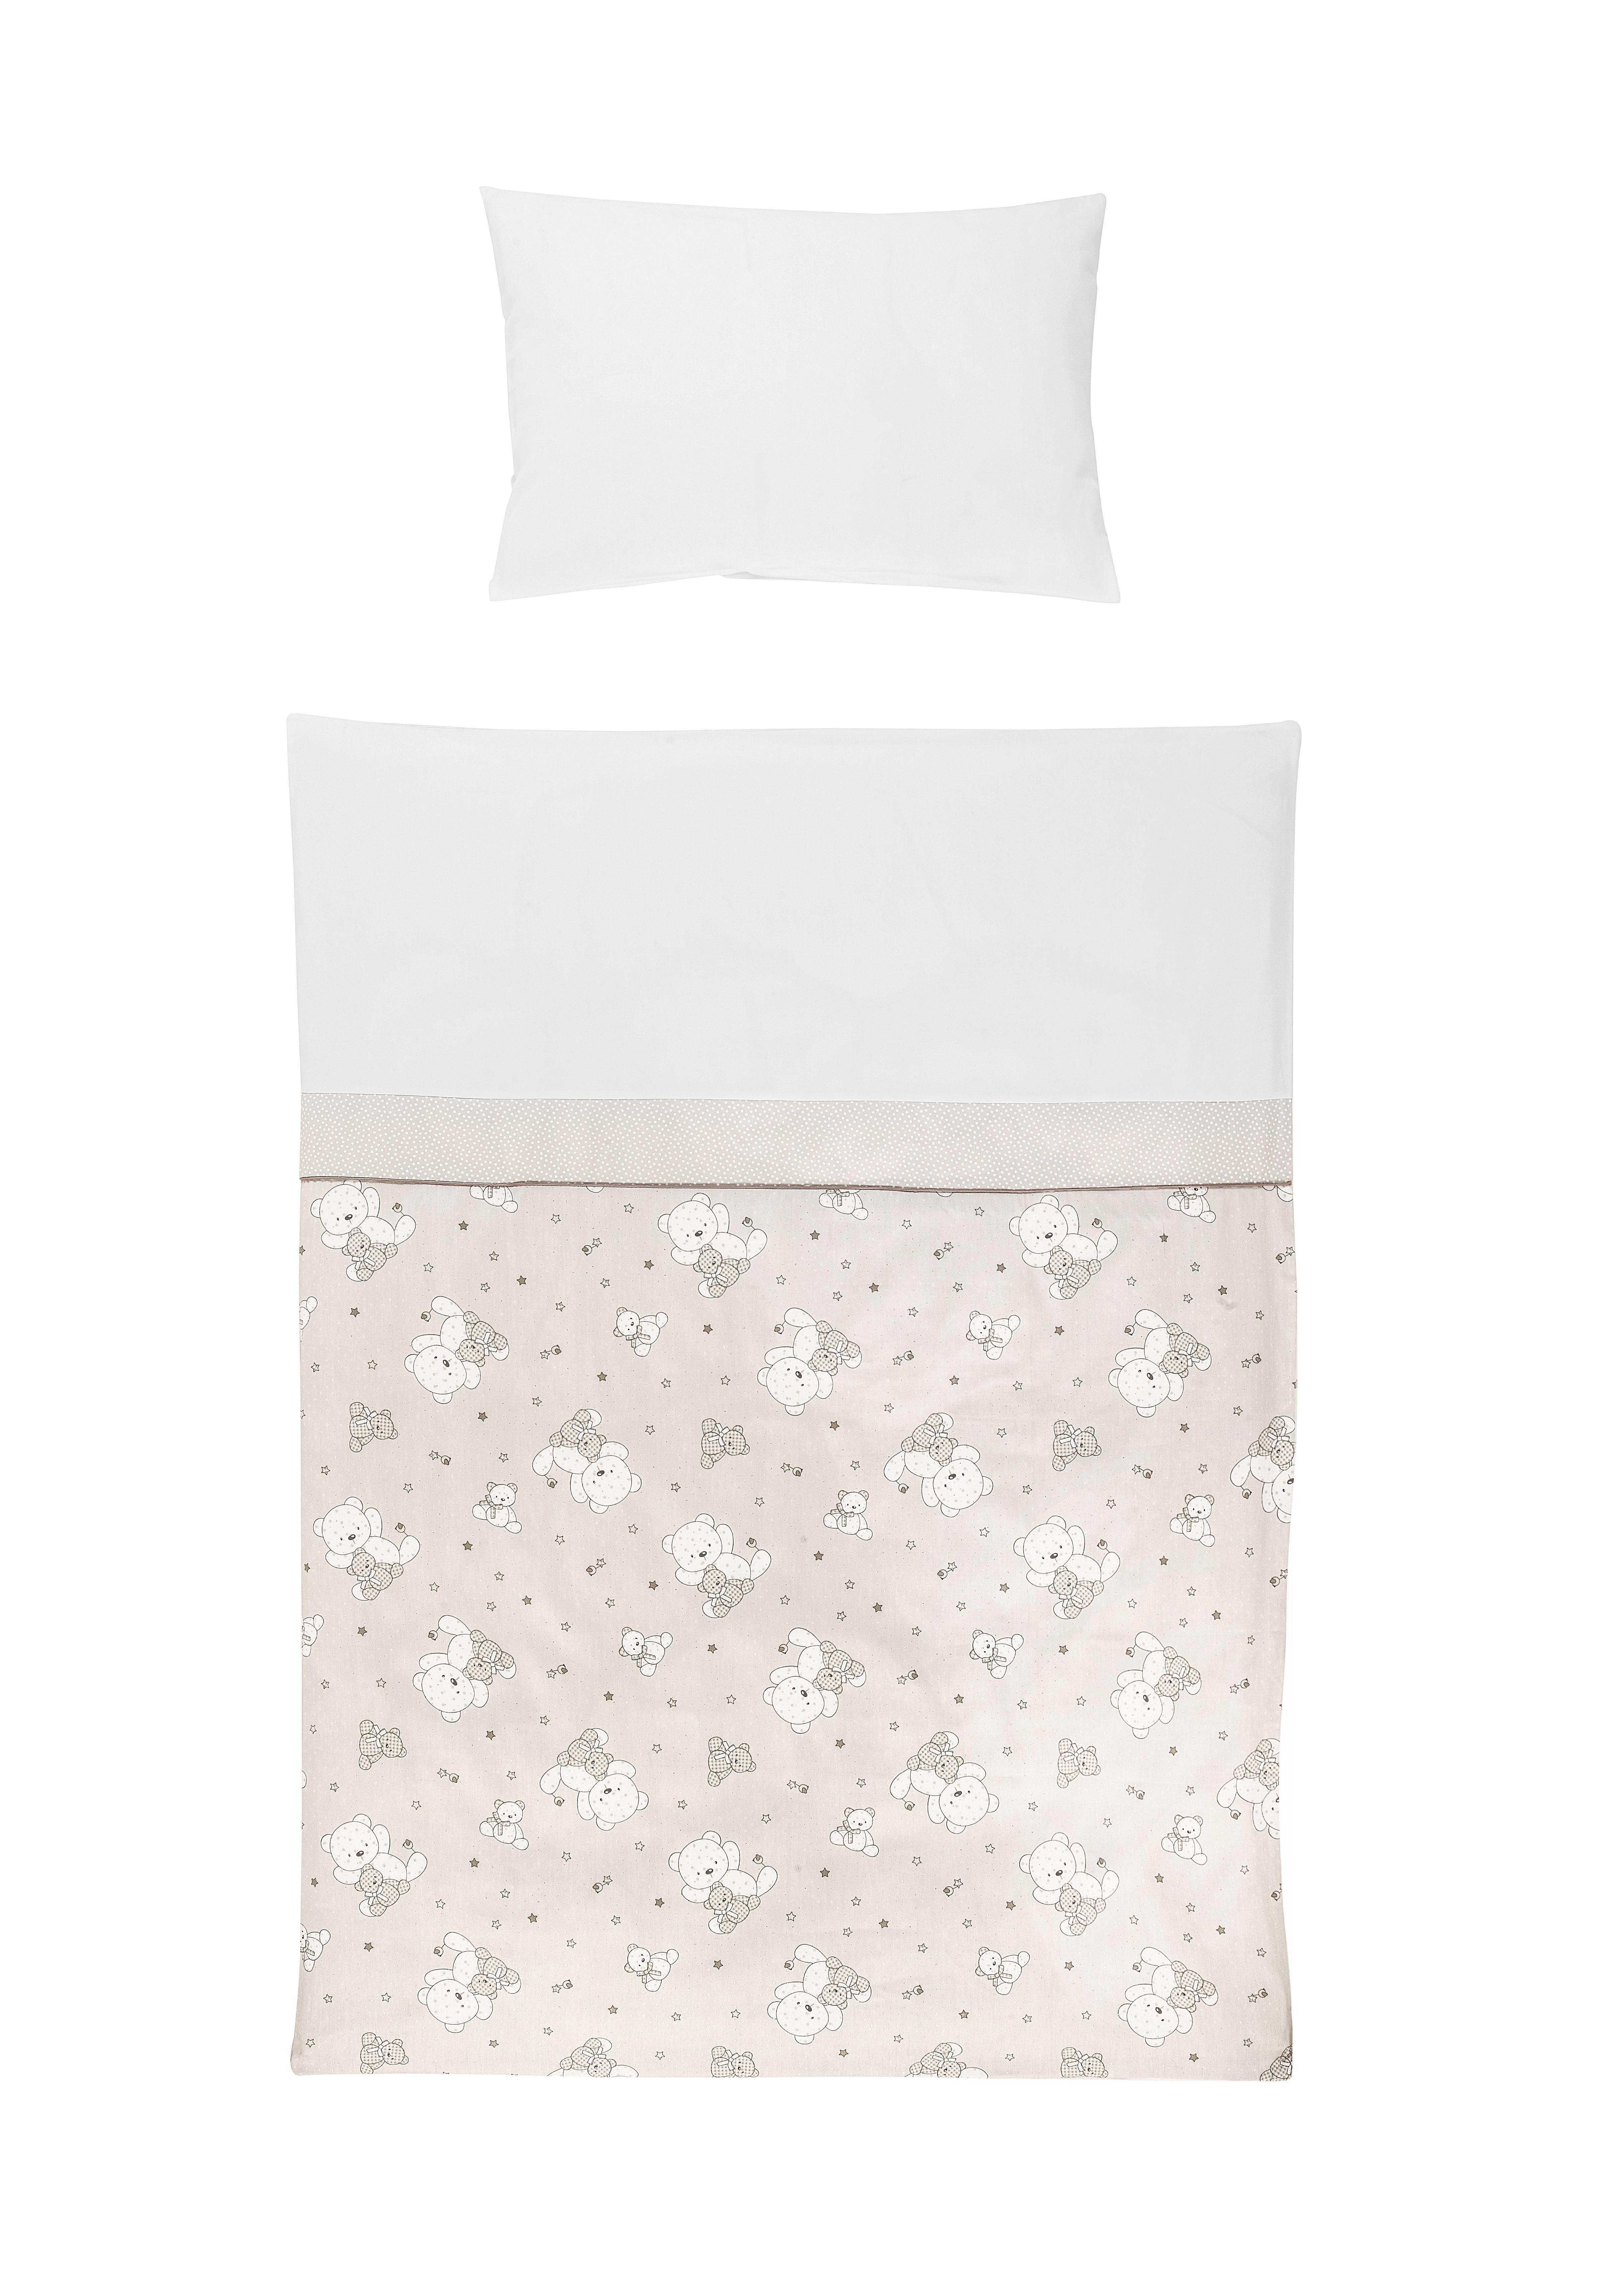 POSTELJINA ZA BEBE - bijela/taupe, Basics, tekstil (100/135cm) - My Baby Lou